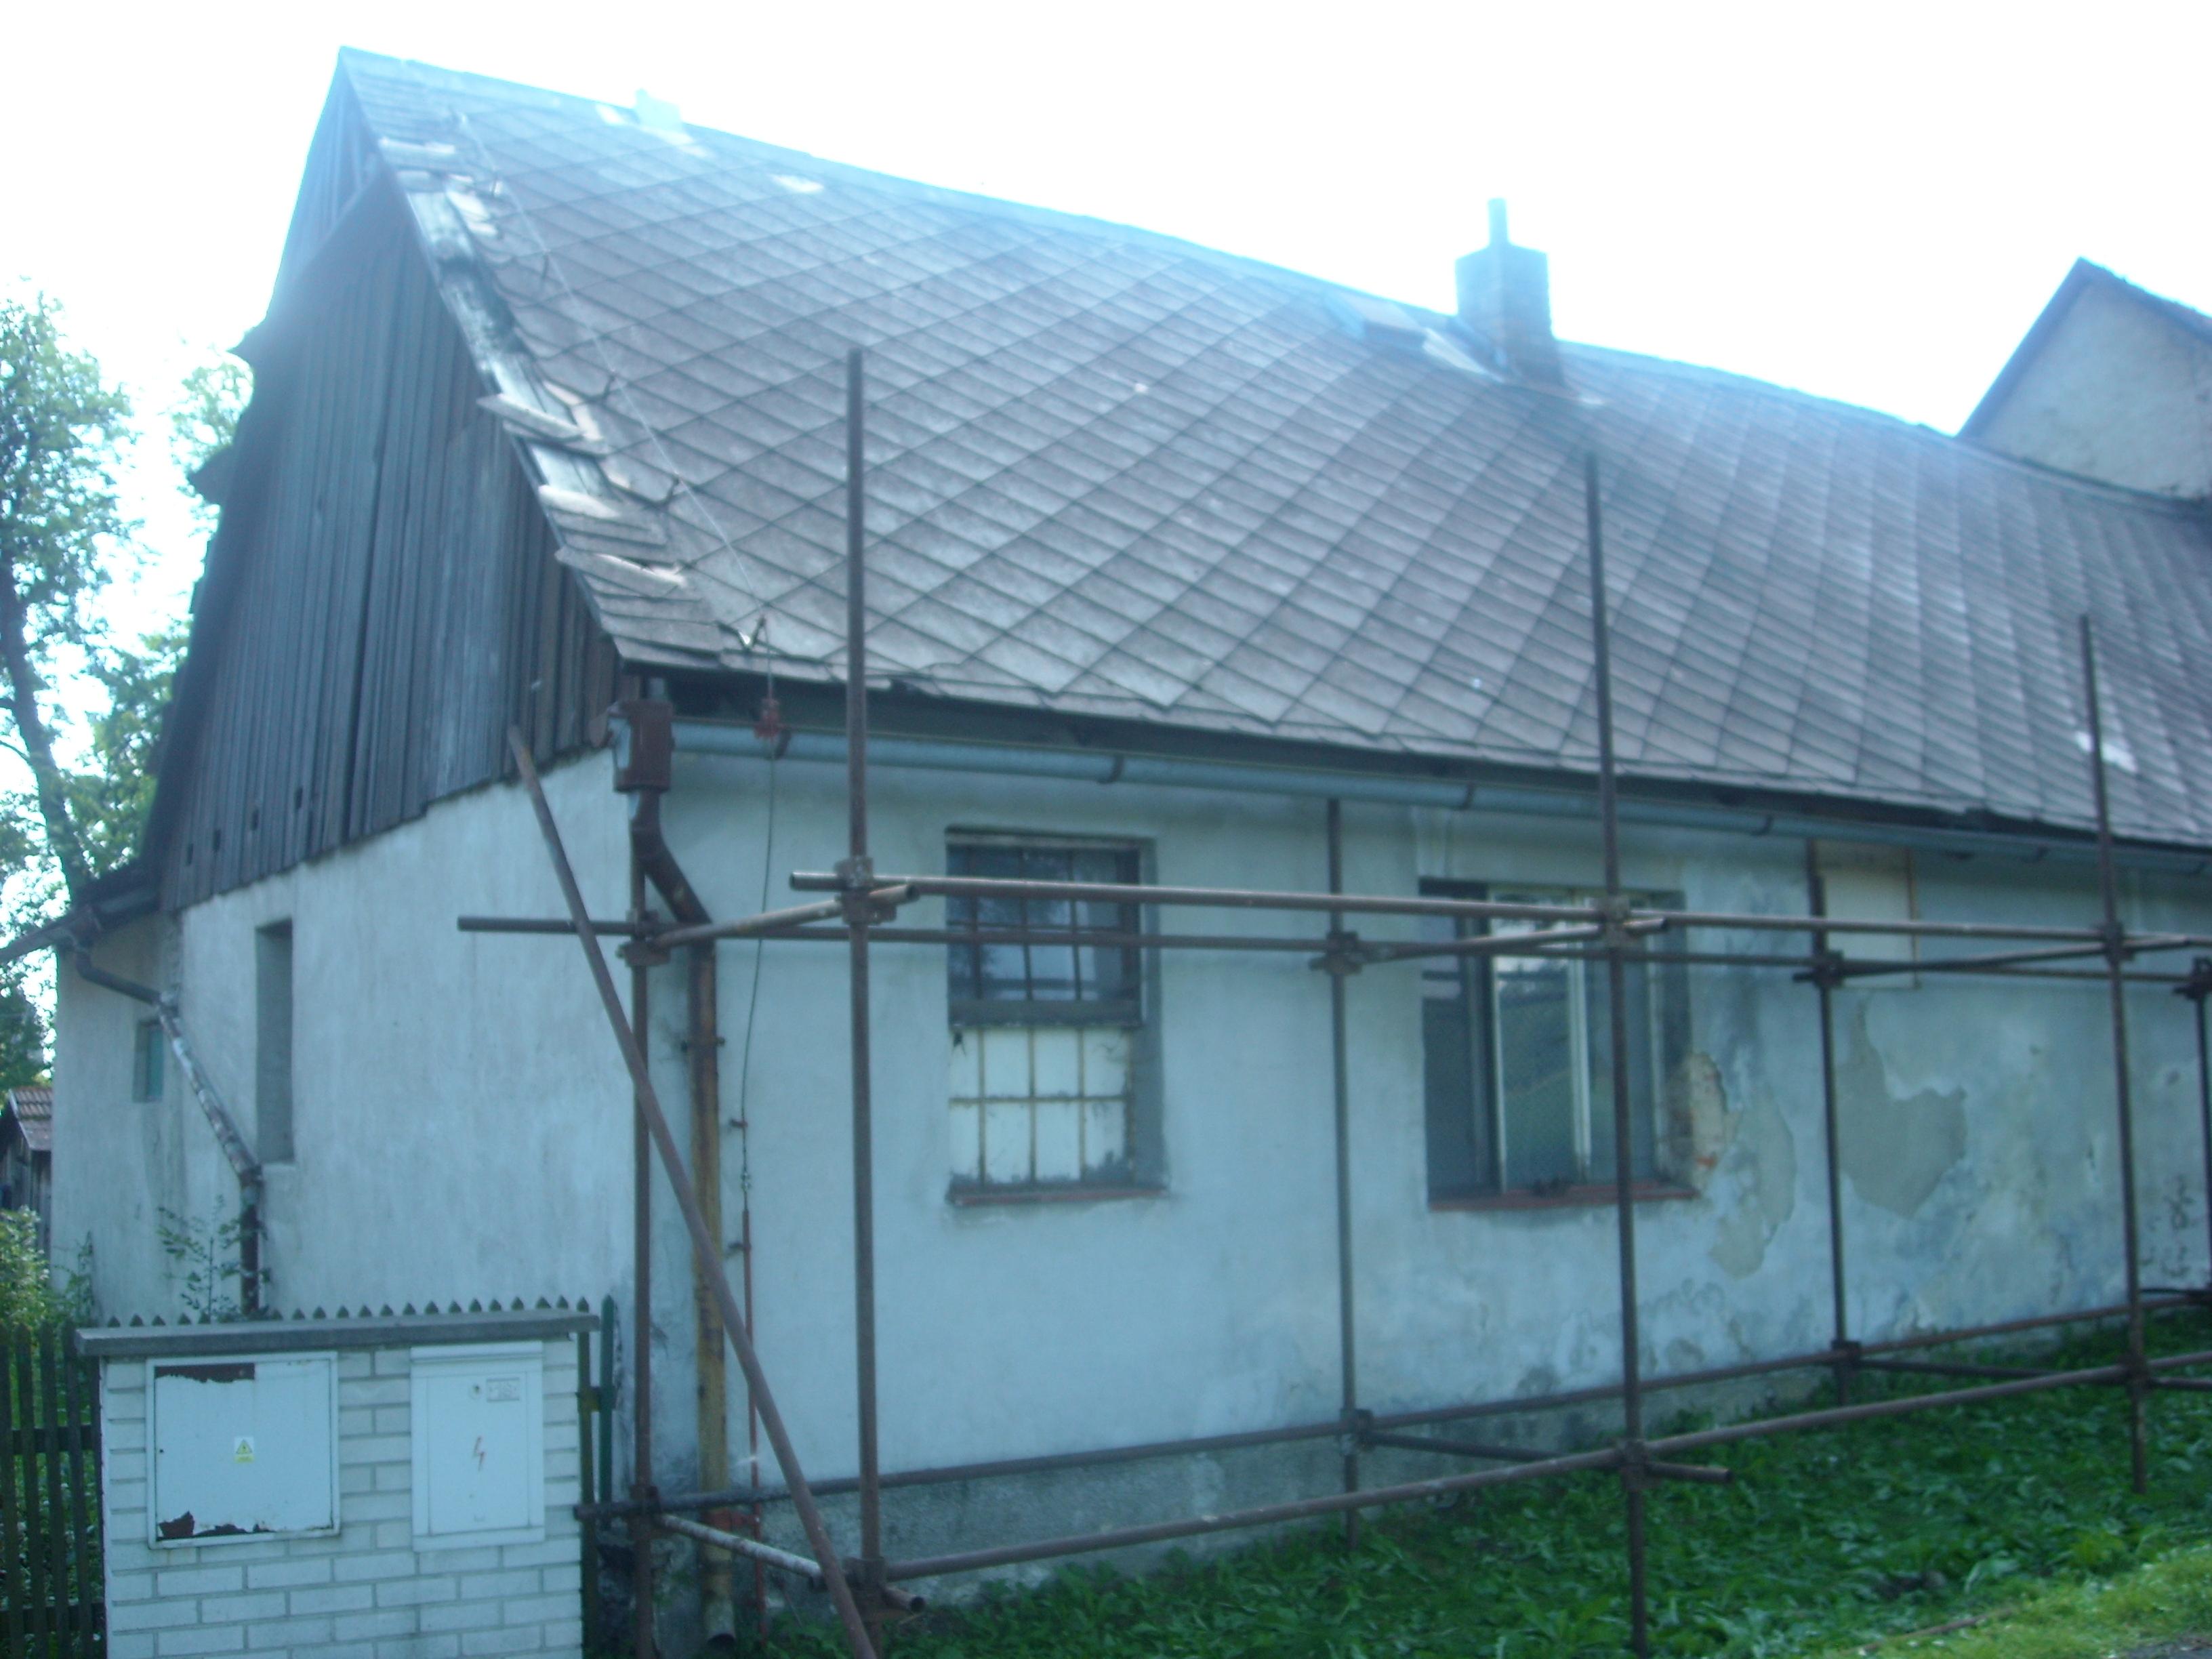 04 stav pred obnovou